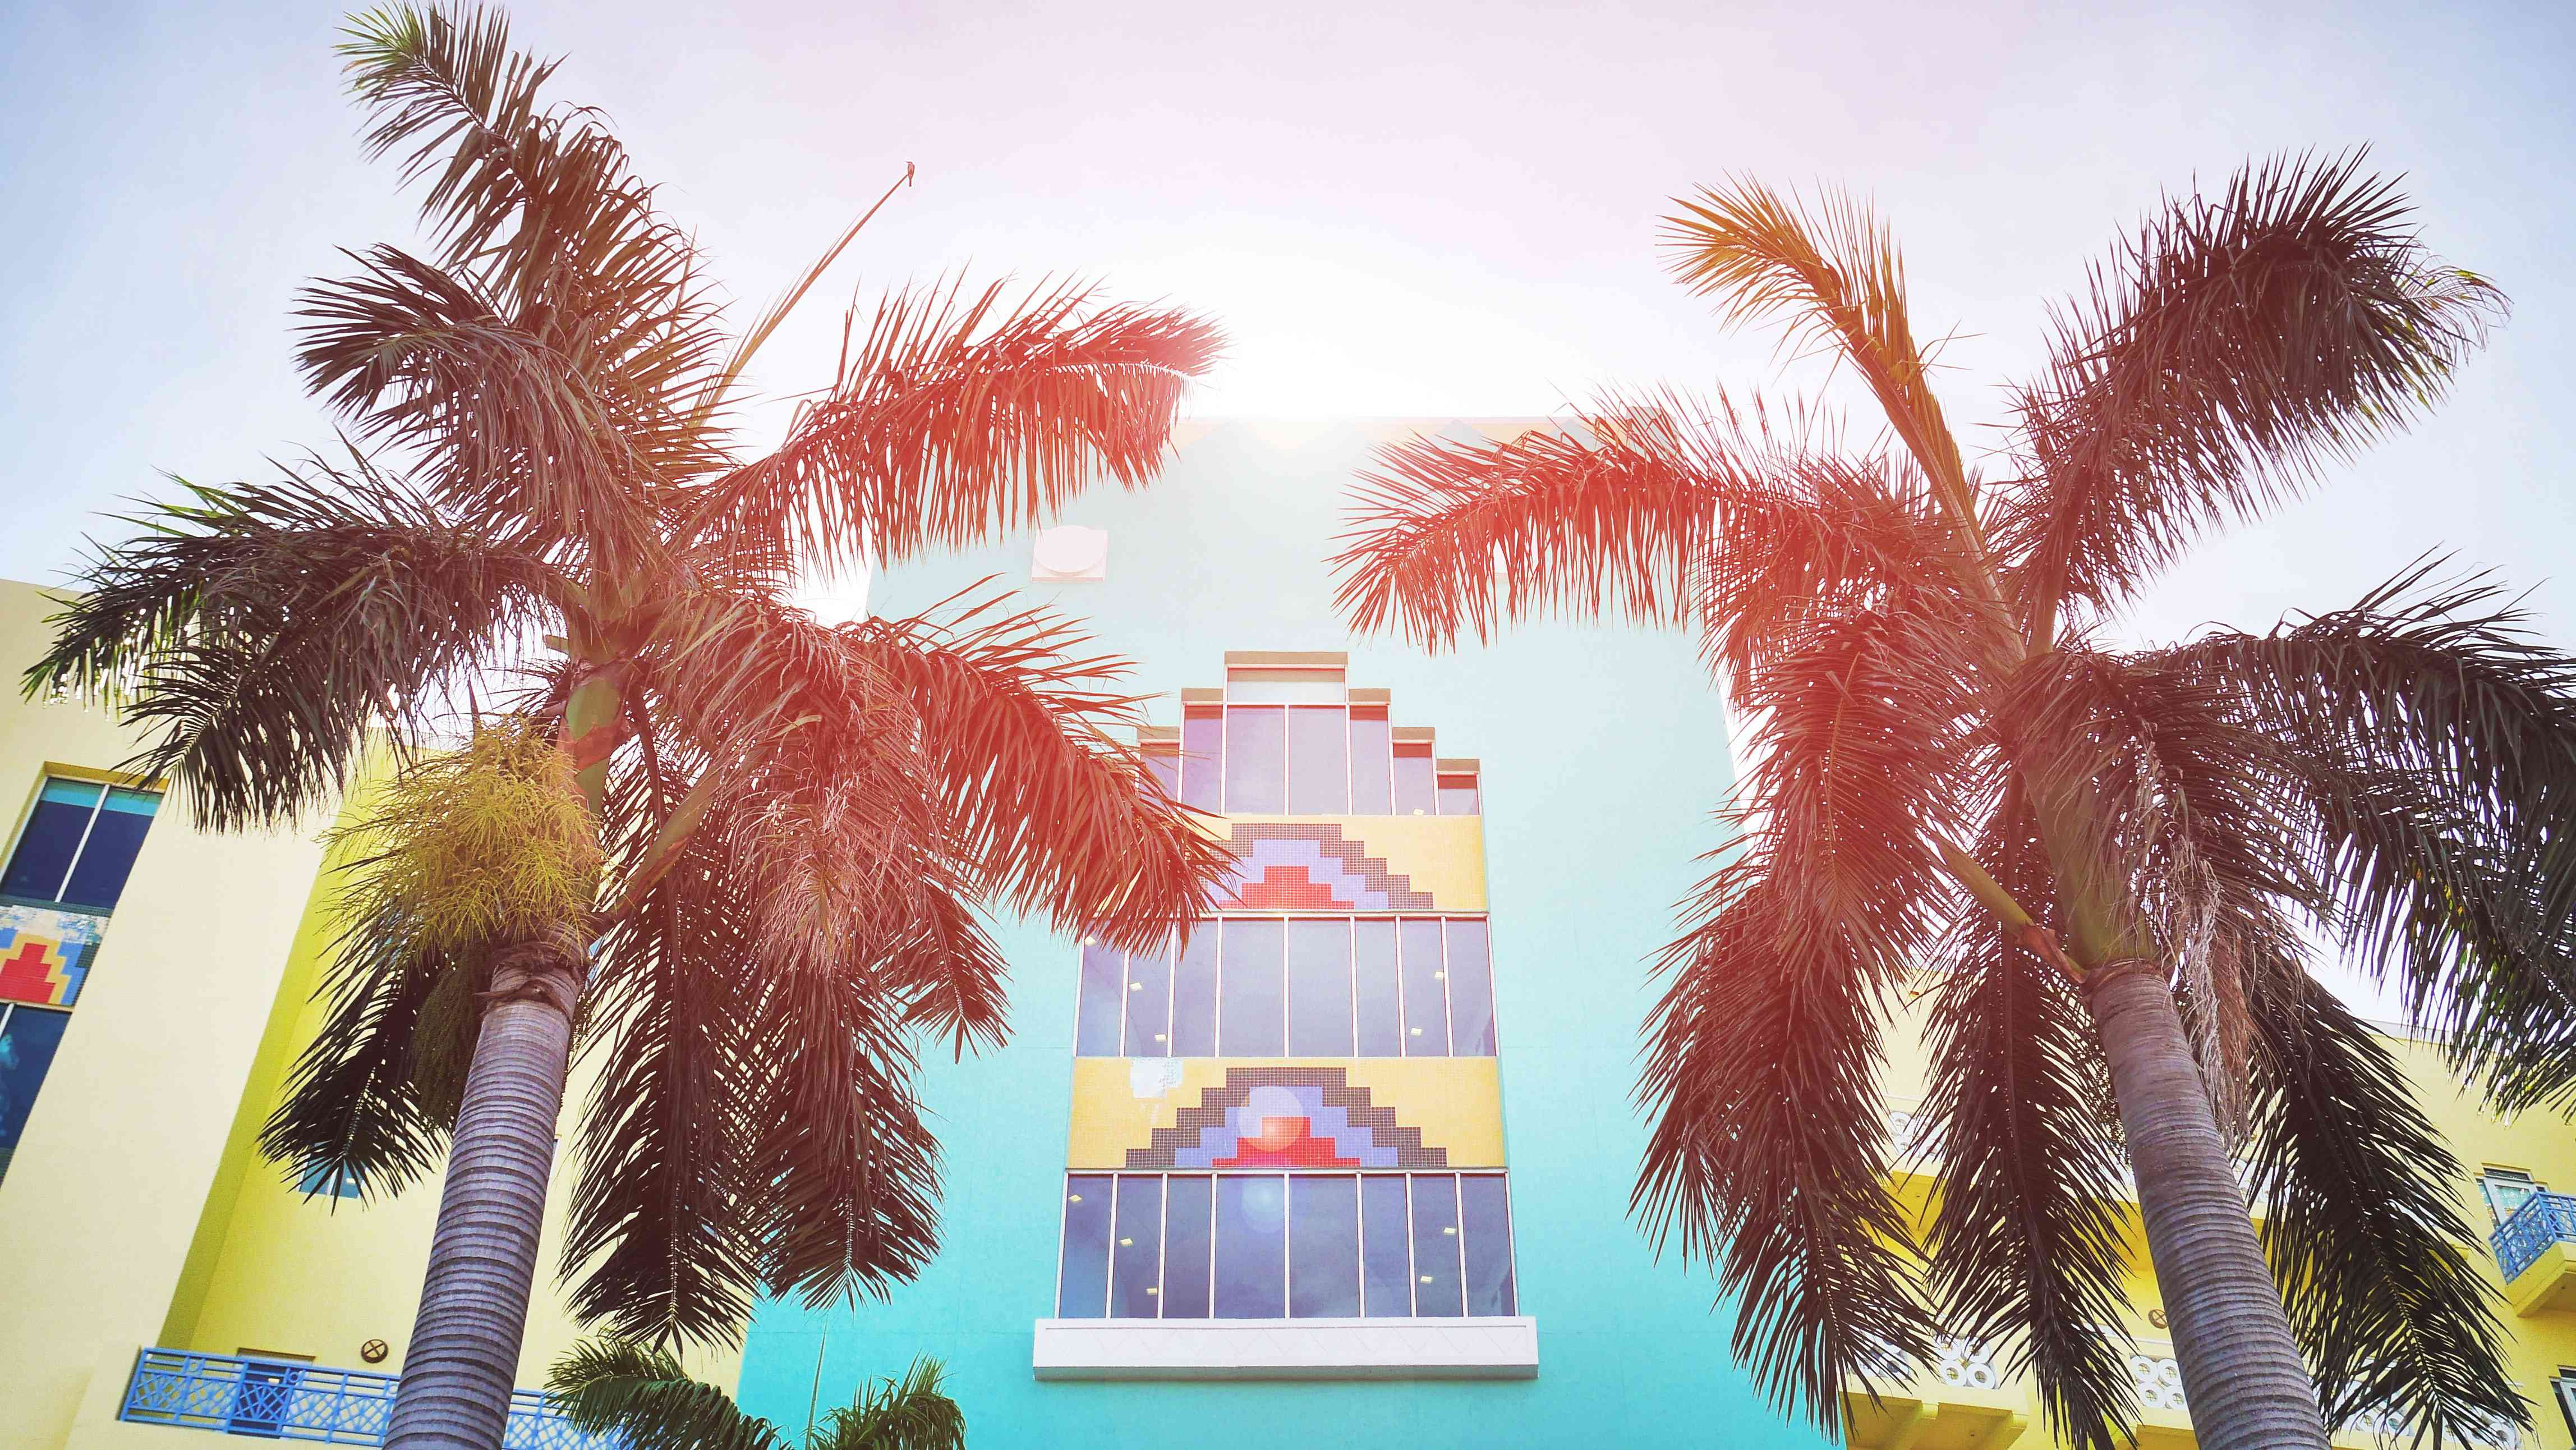 Art Deco building in South Beach